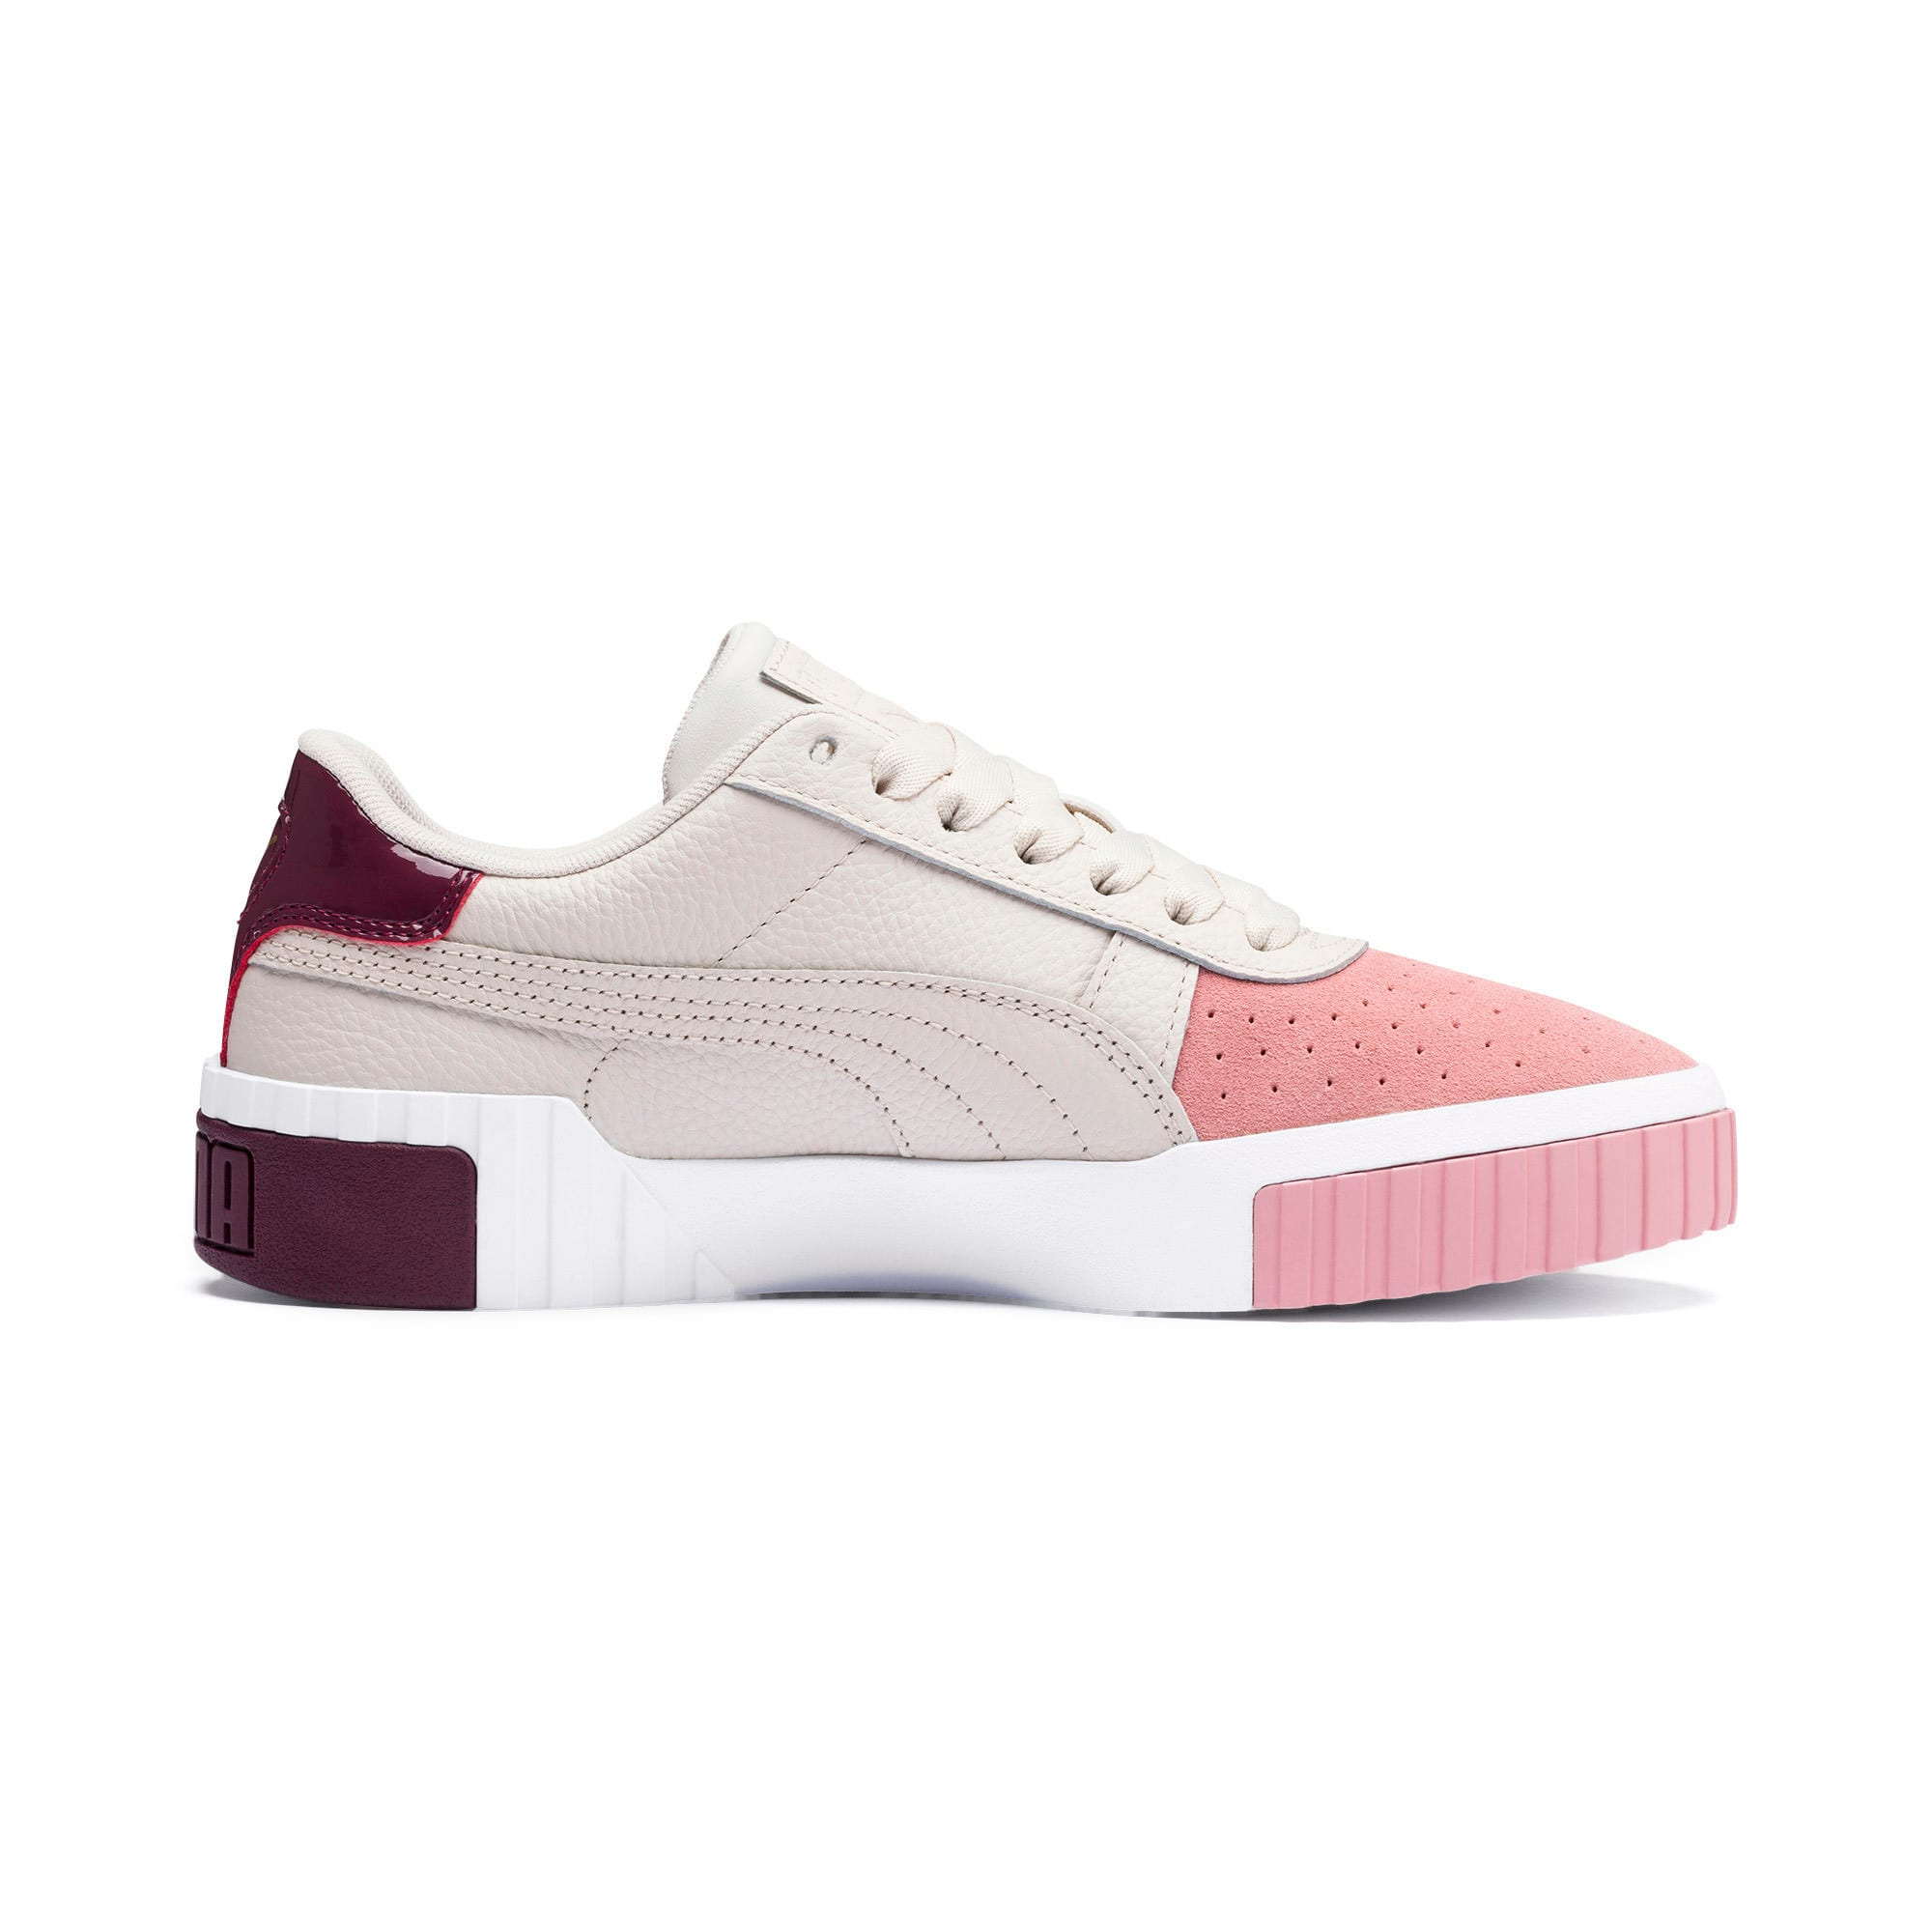 Thumbnail 6 of Cali Remix Women's Sneakers, Pastel Parchment-Bridal Rose, medium